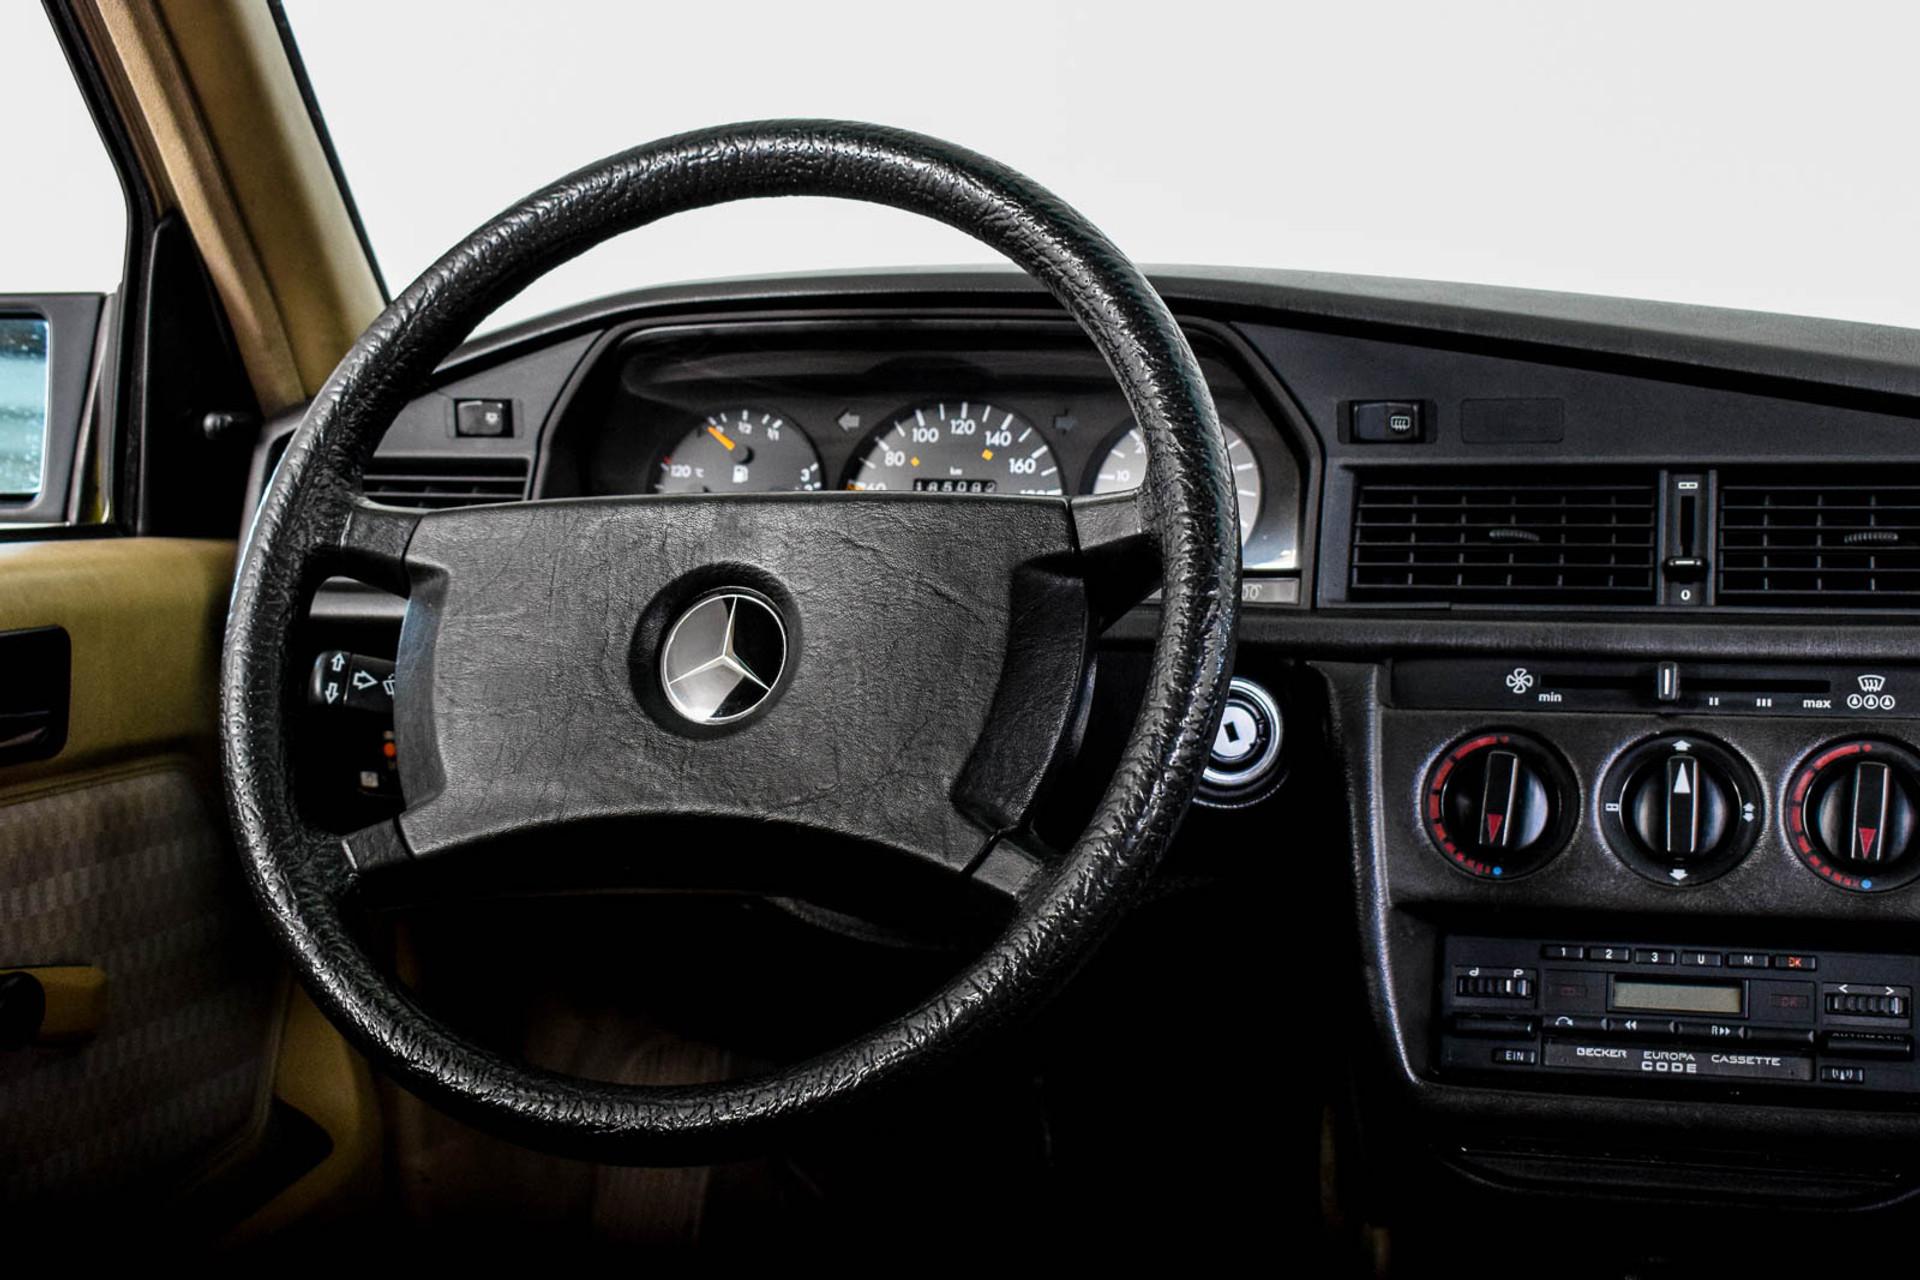 Mercedes-Benz 190 2.5 D Turbo Diesel Foto 17